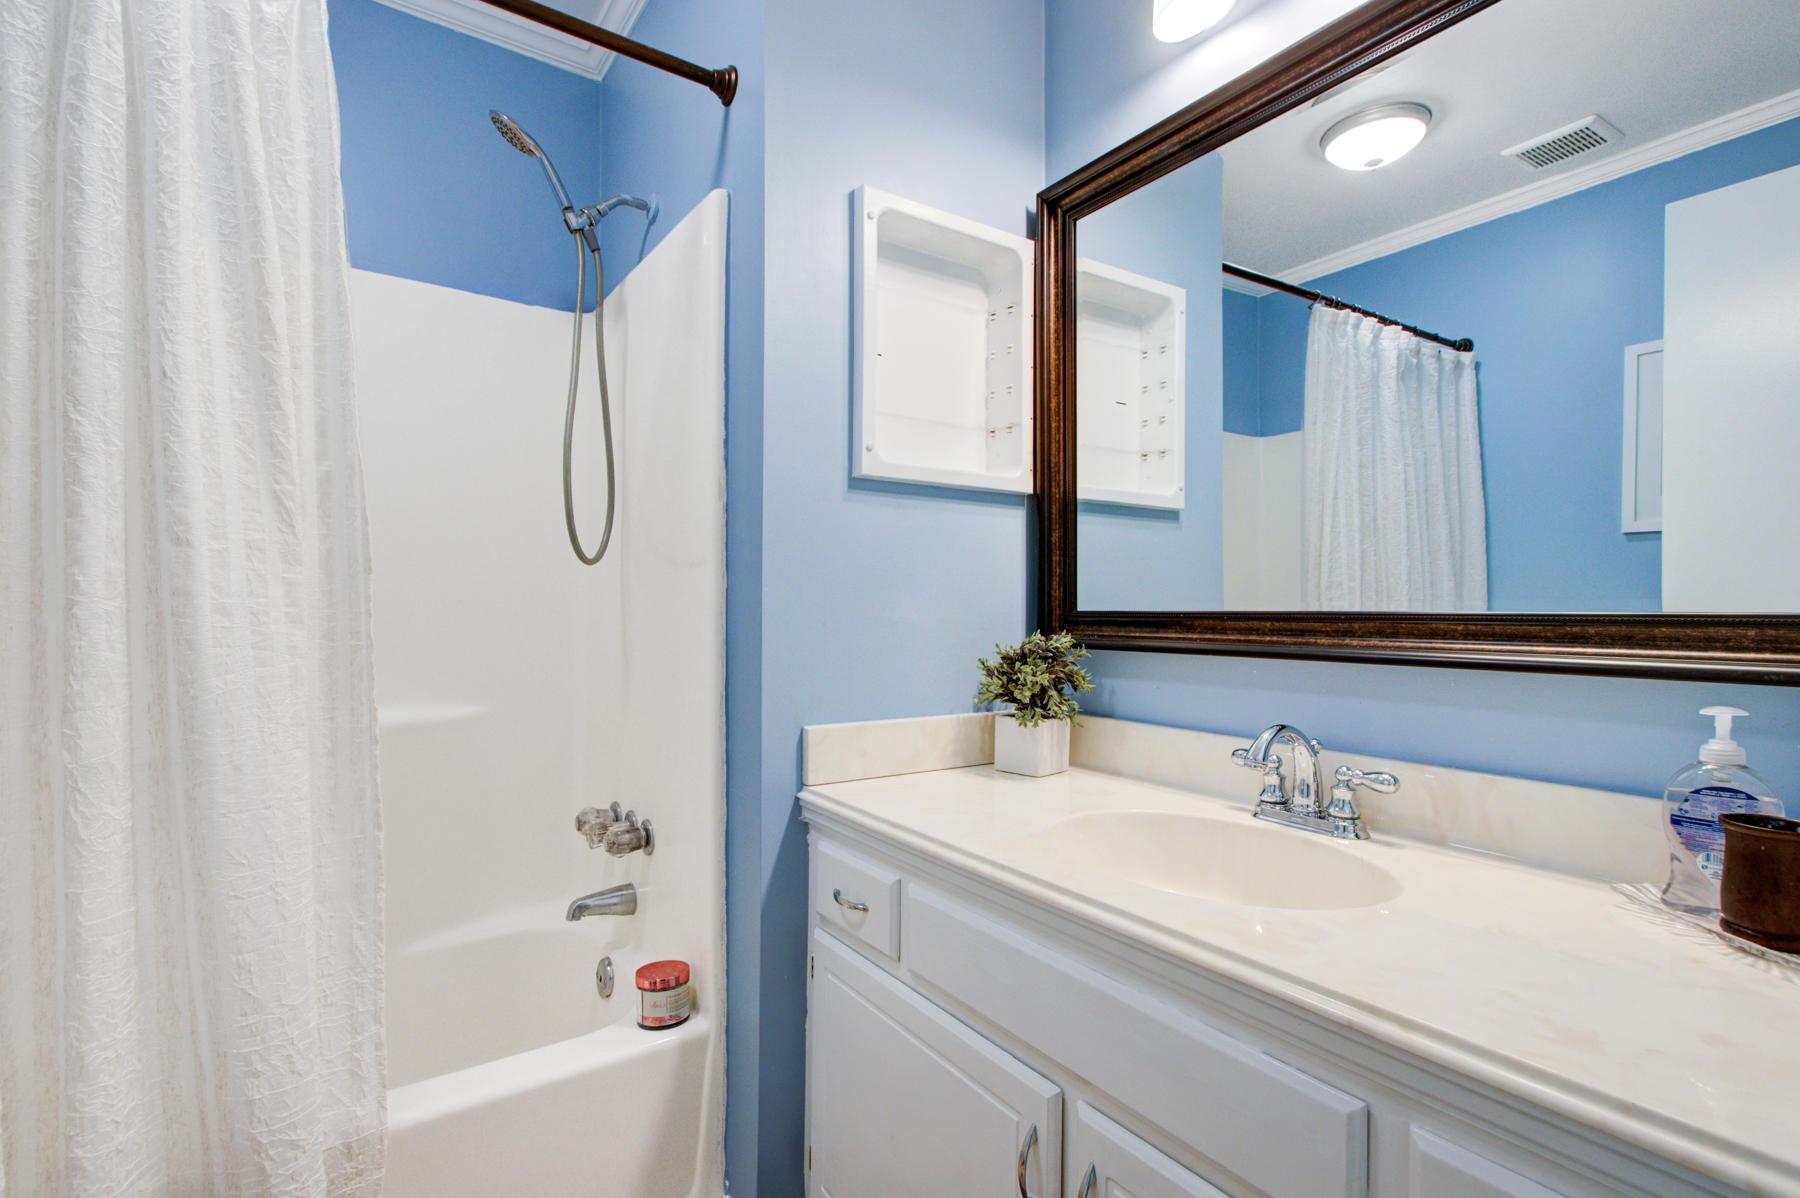 Snee Farm Lakes Homes For Sale - 1120 Hidden Cove, Mount Pleasant, SC - 13